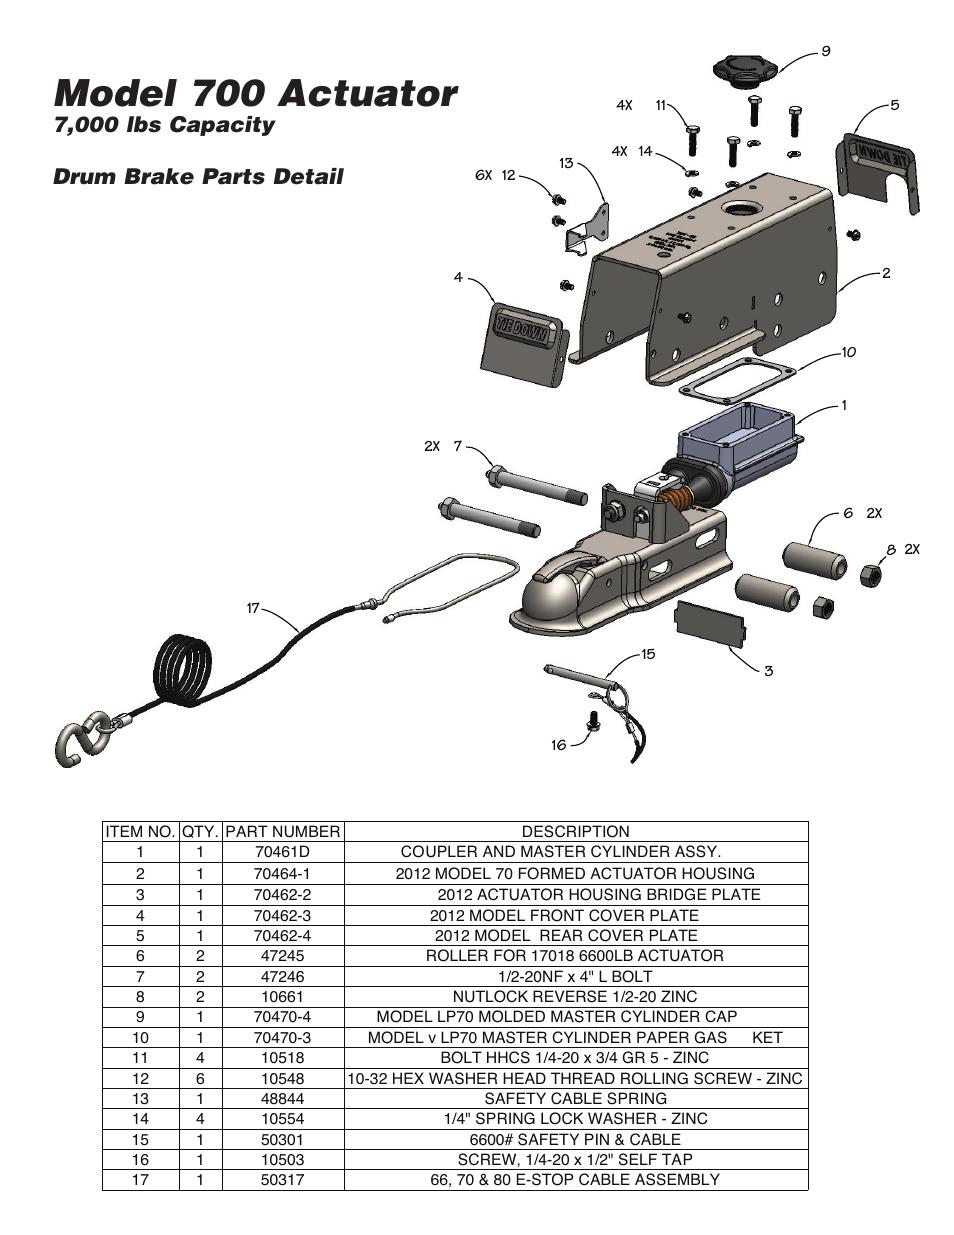 Model 700 actuator, 7,000 lbs capacity drum brake parts